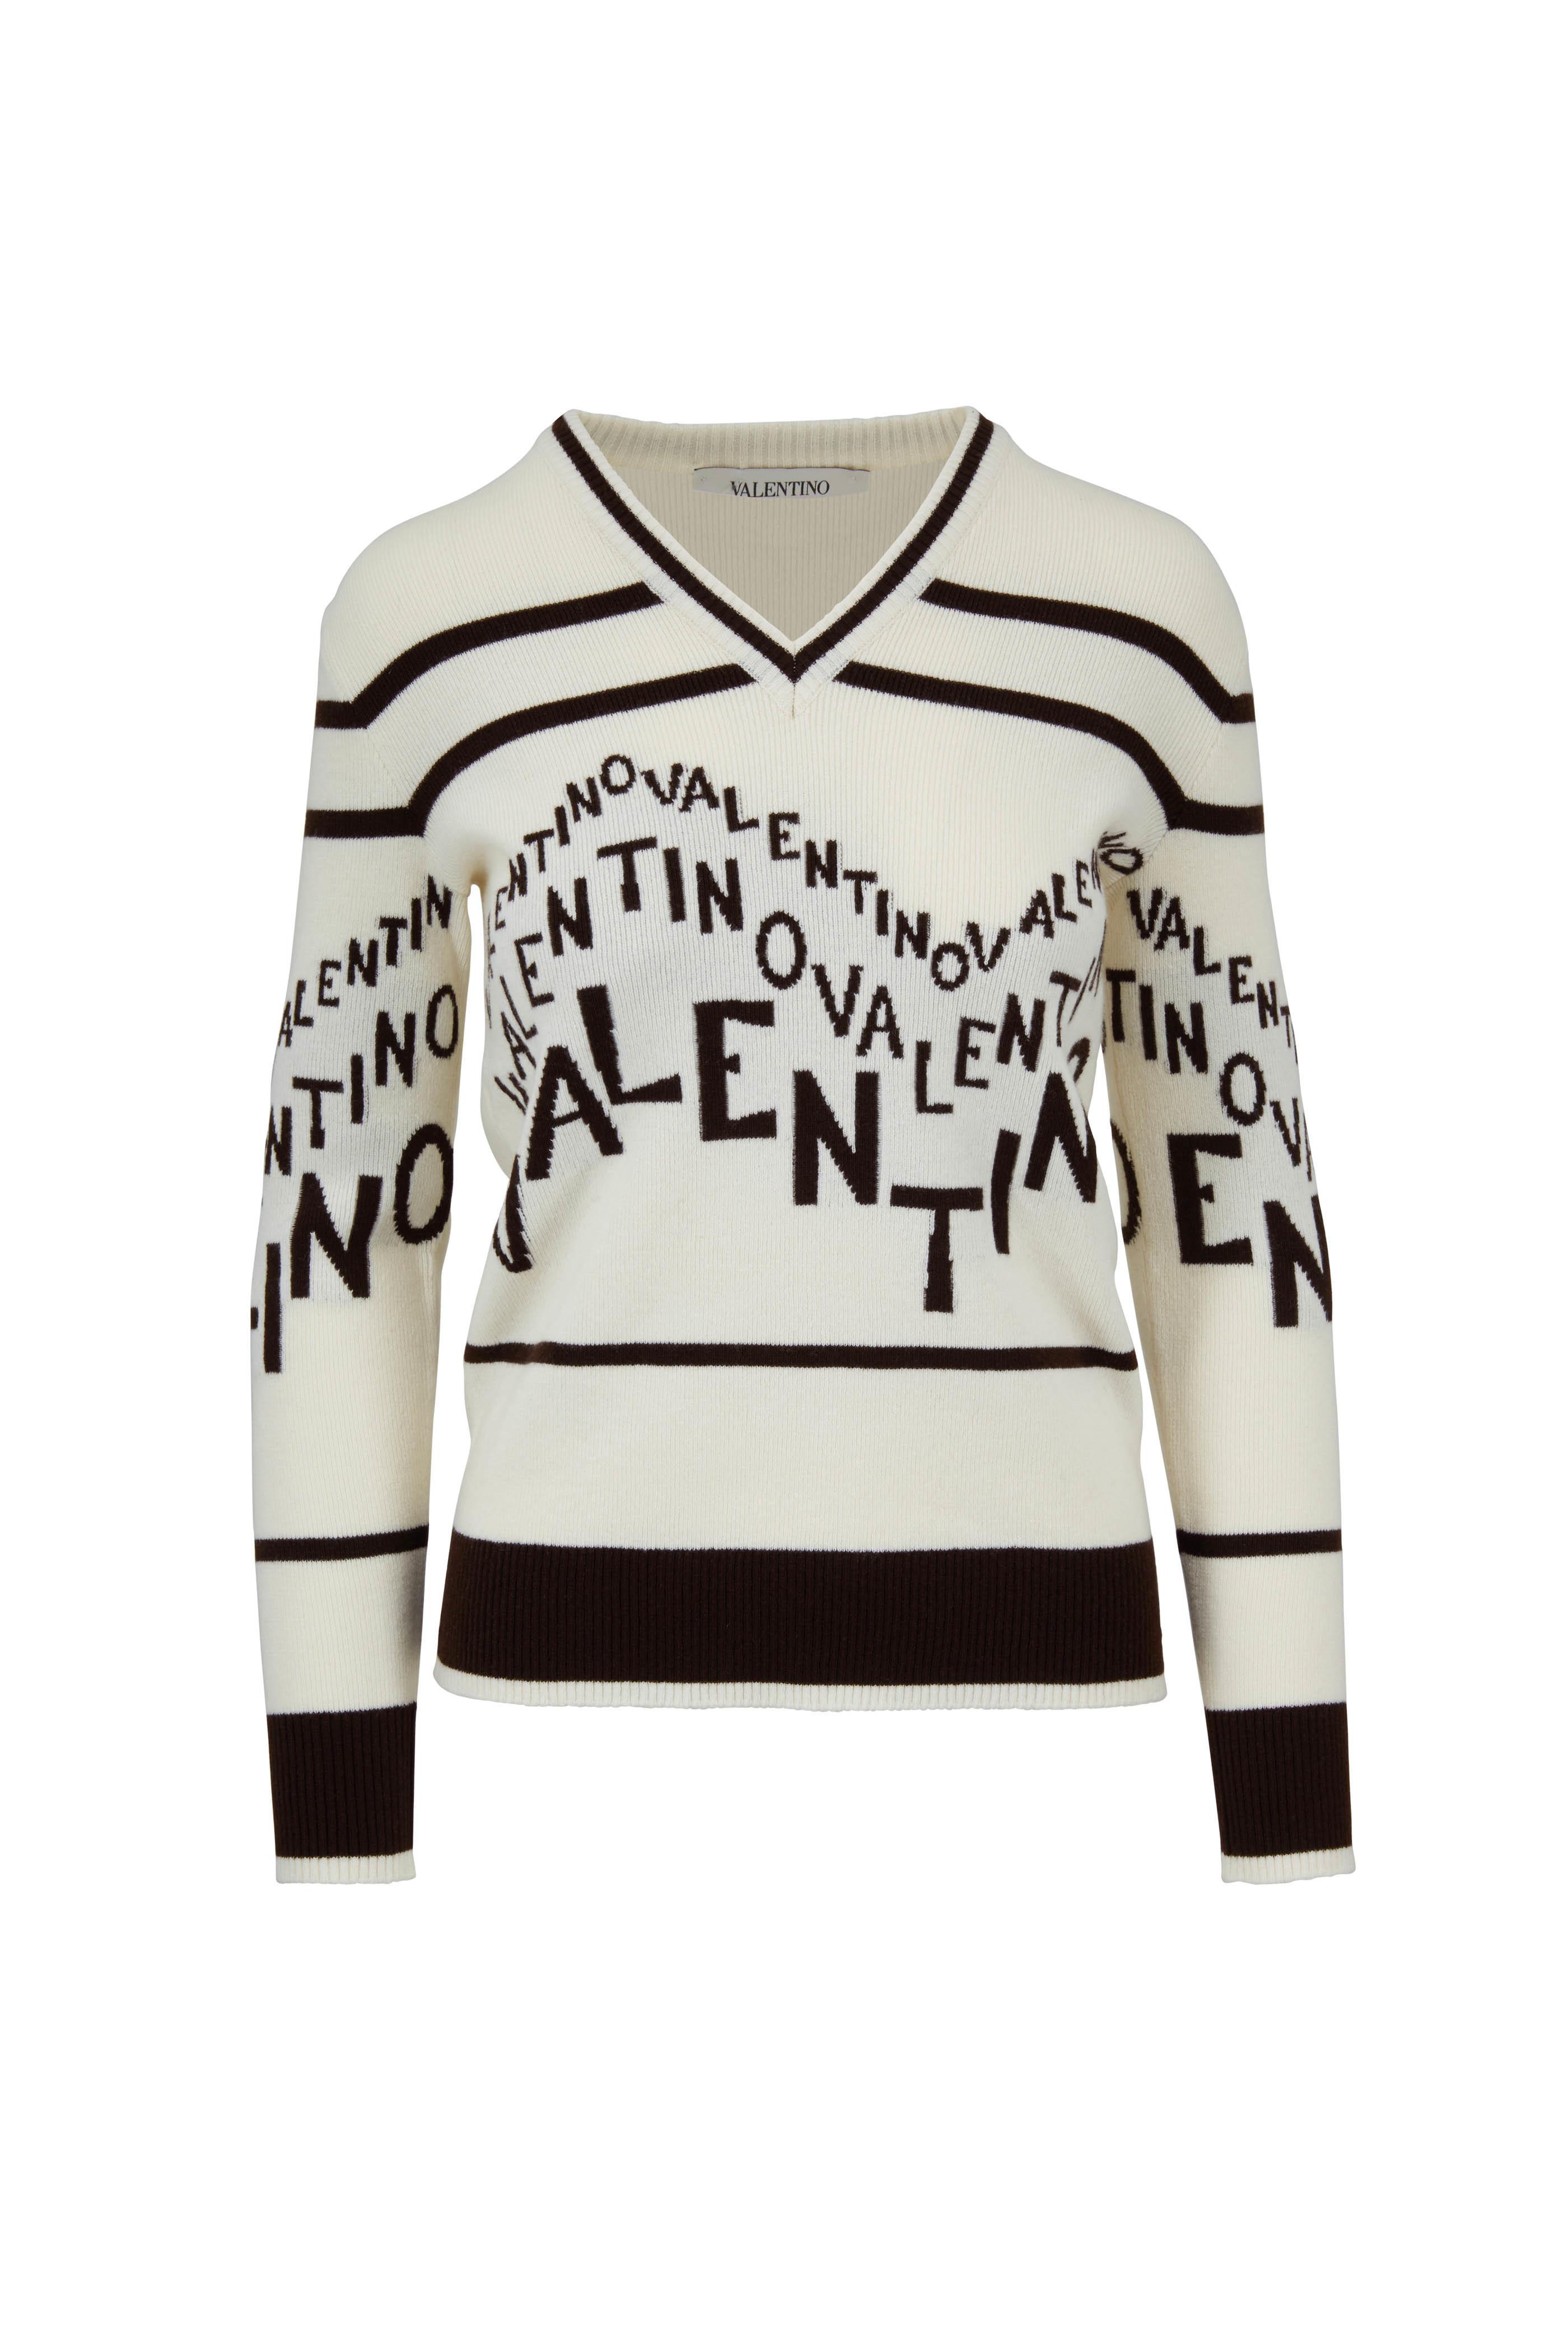 6773625f8035b4 Valentino - Logo Chevron Wool & Cashmere Sweater | Mitchell Stores